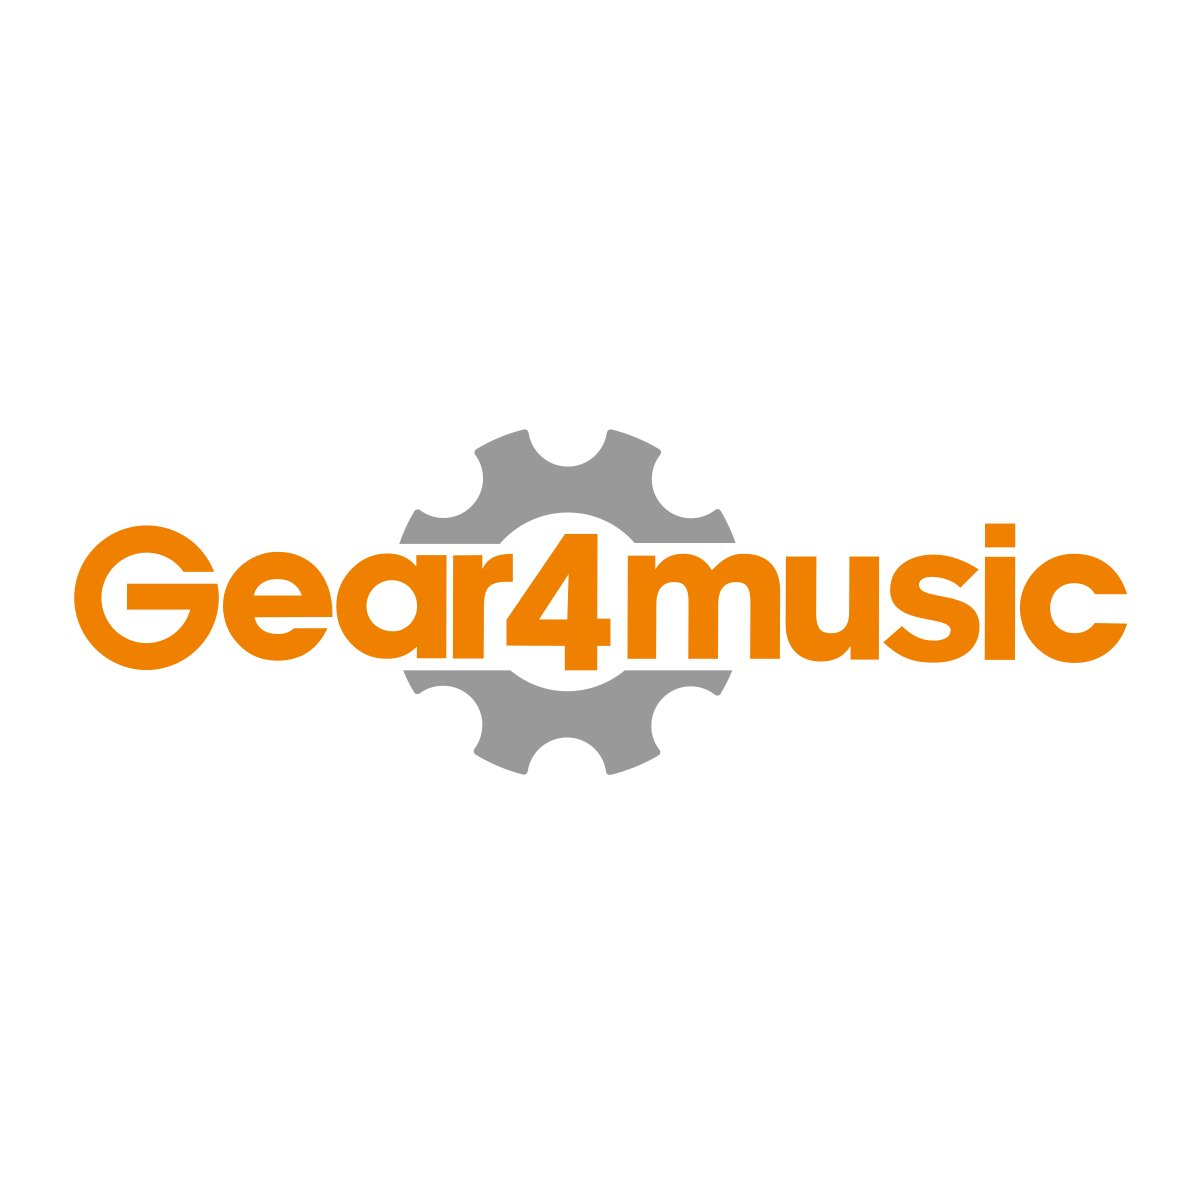 Noise Gate Pedals Gear4music